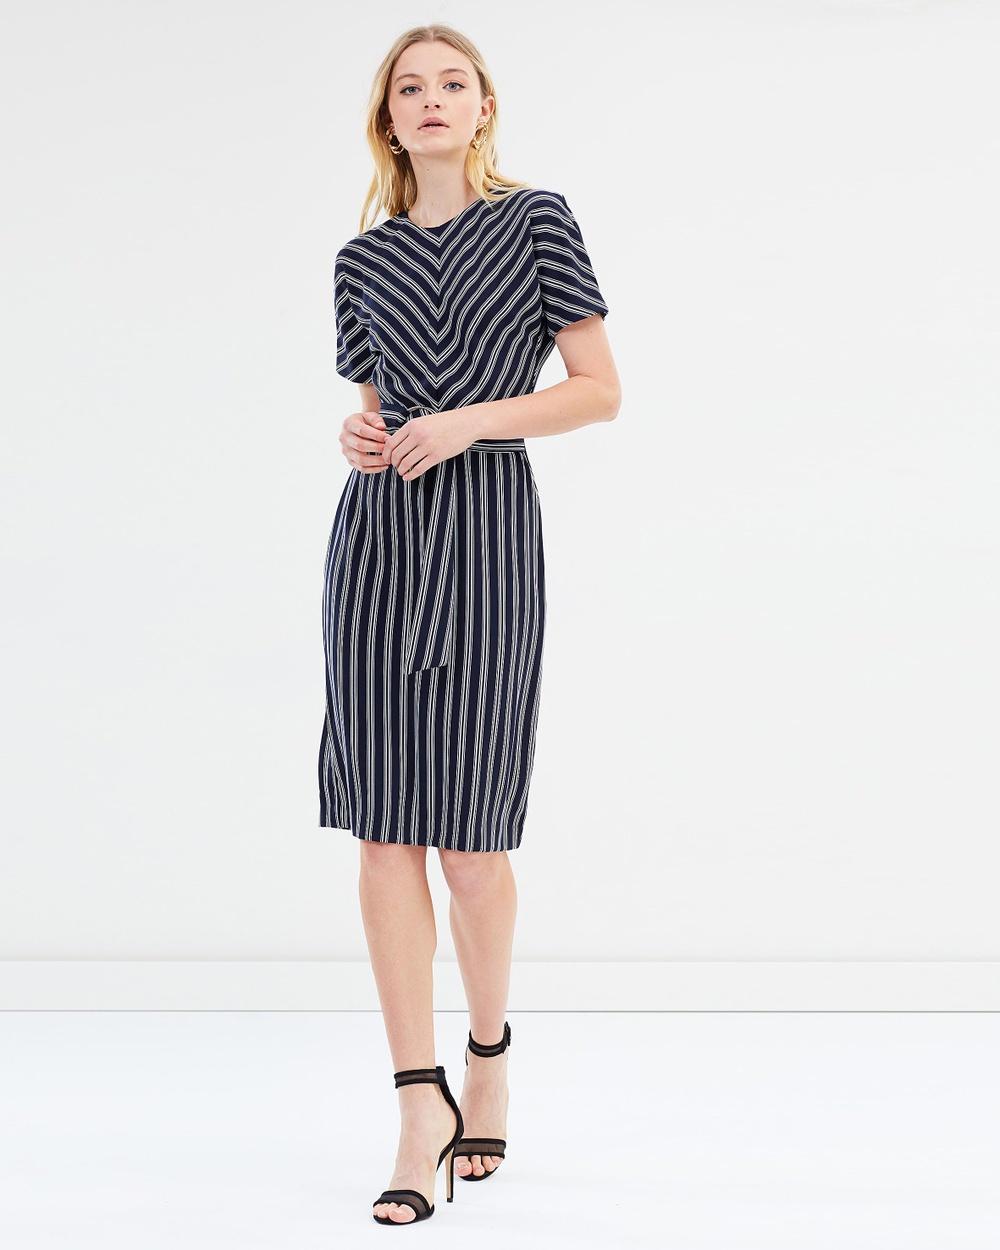 Warehouse Stripe Dress Dresses Navy Stripe Dress